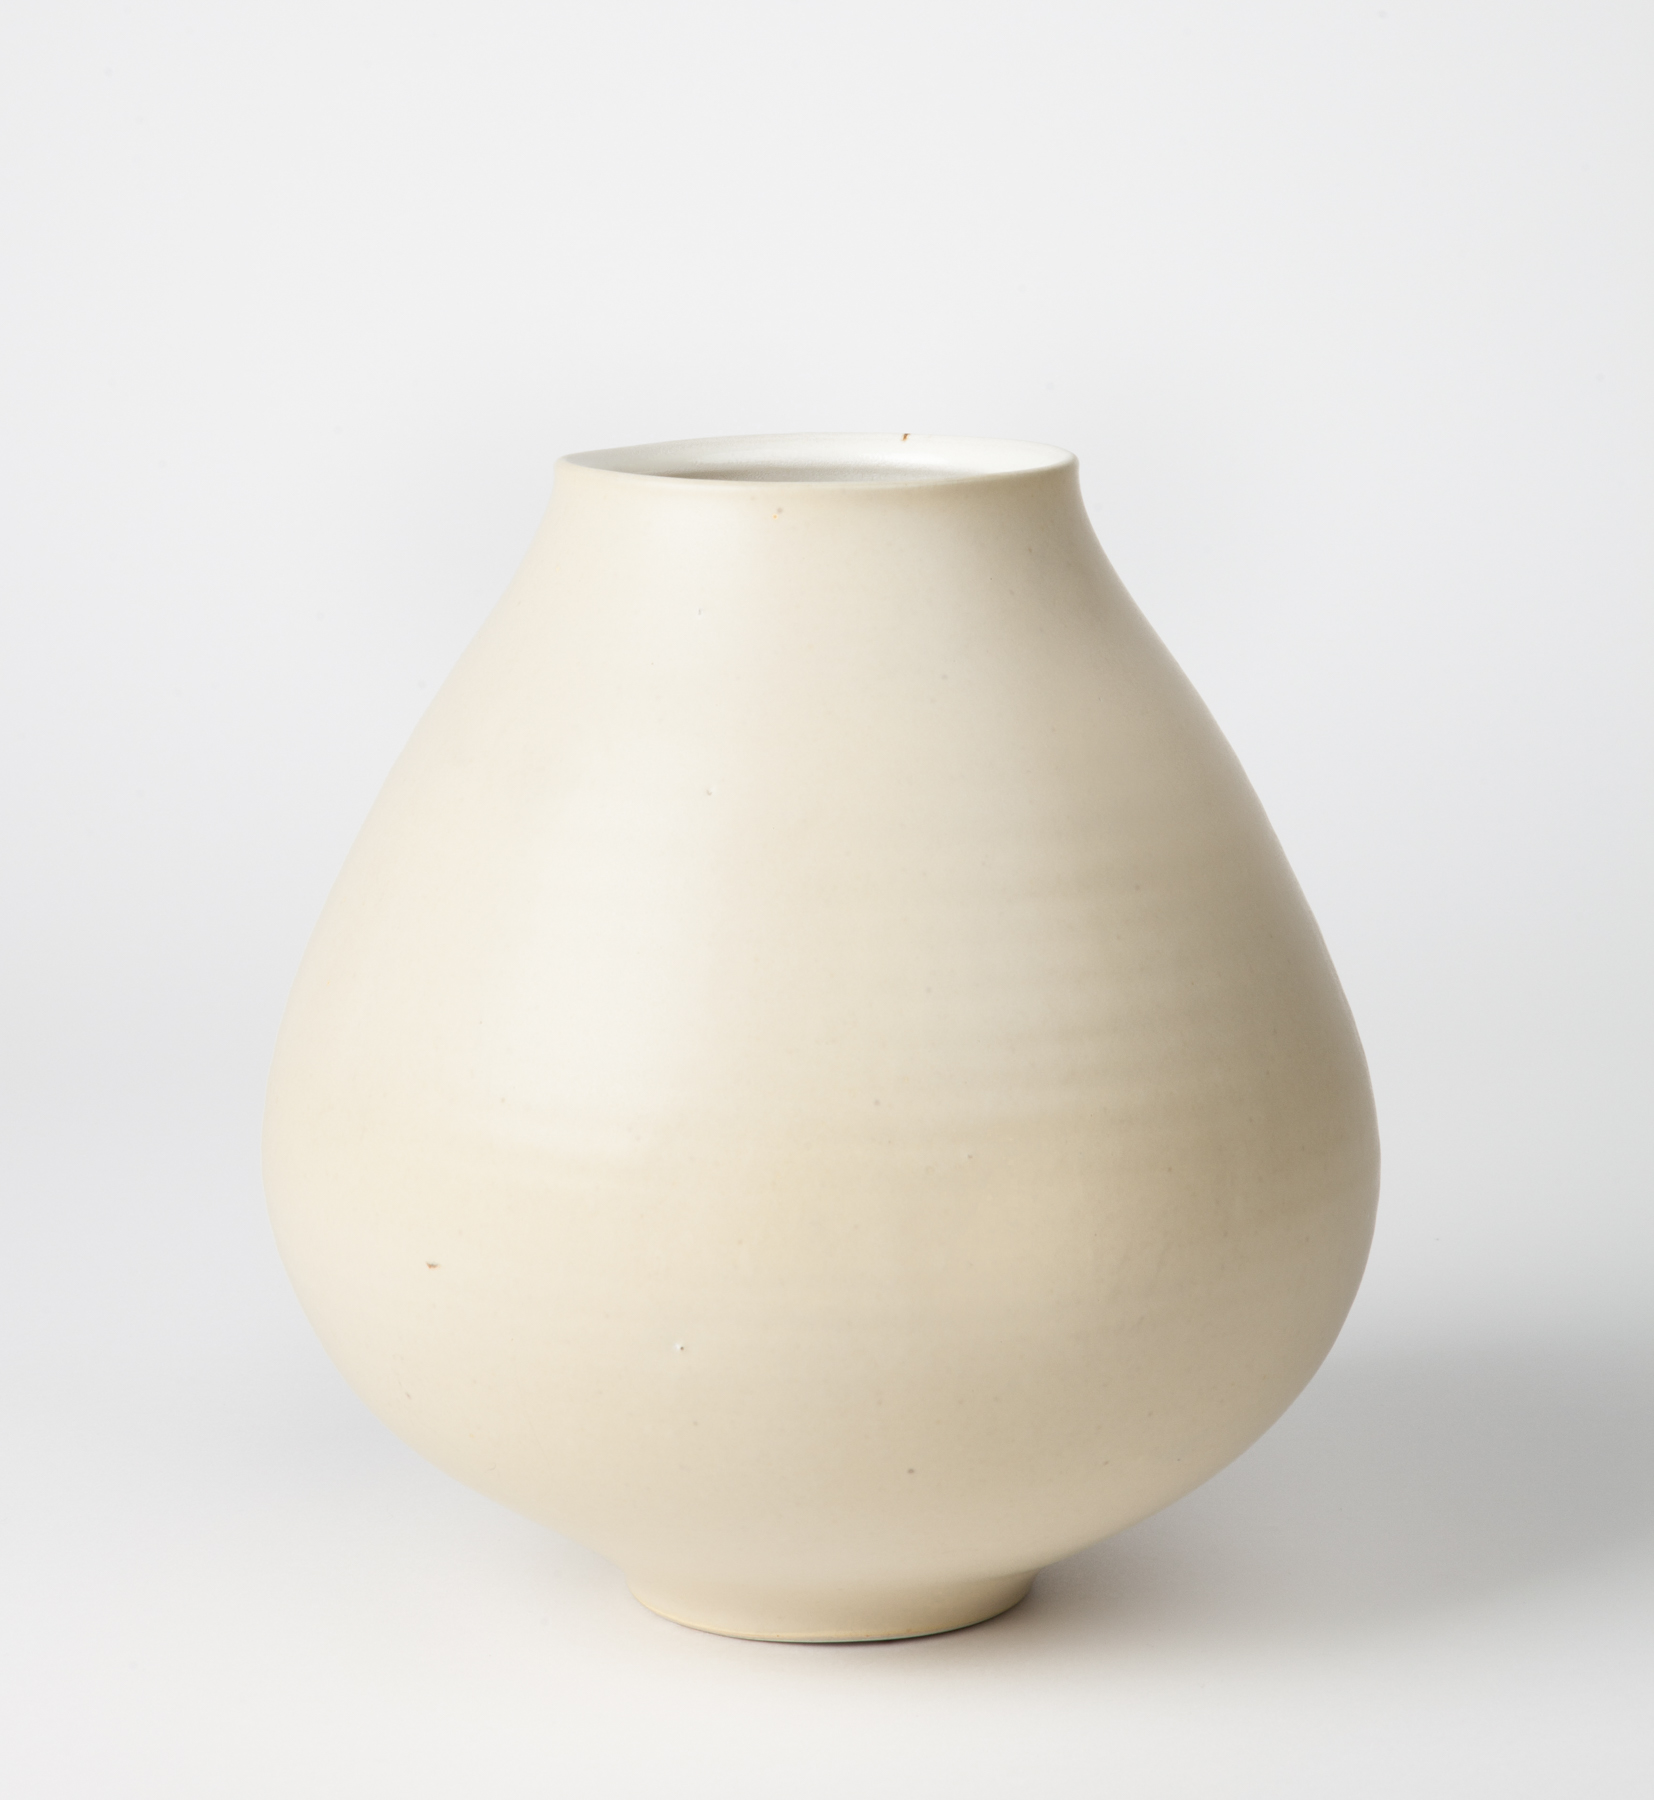 vase, cone 9 reduction porcelain